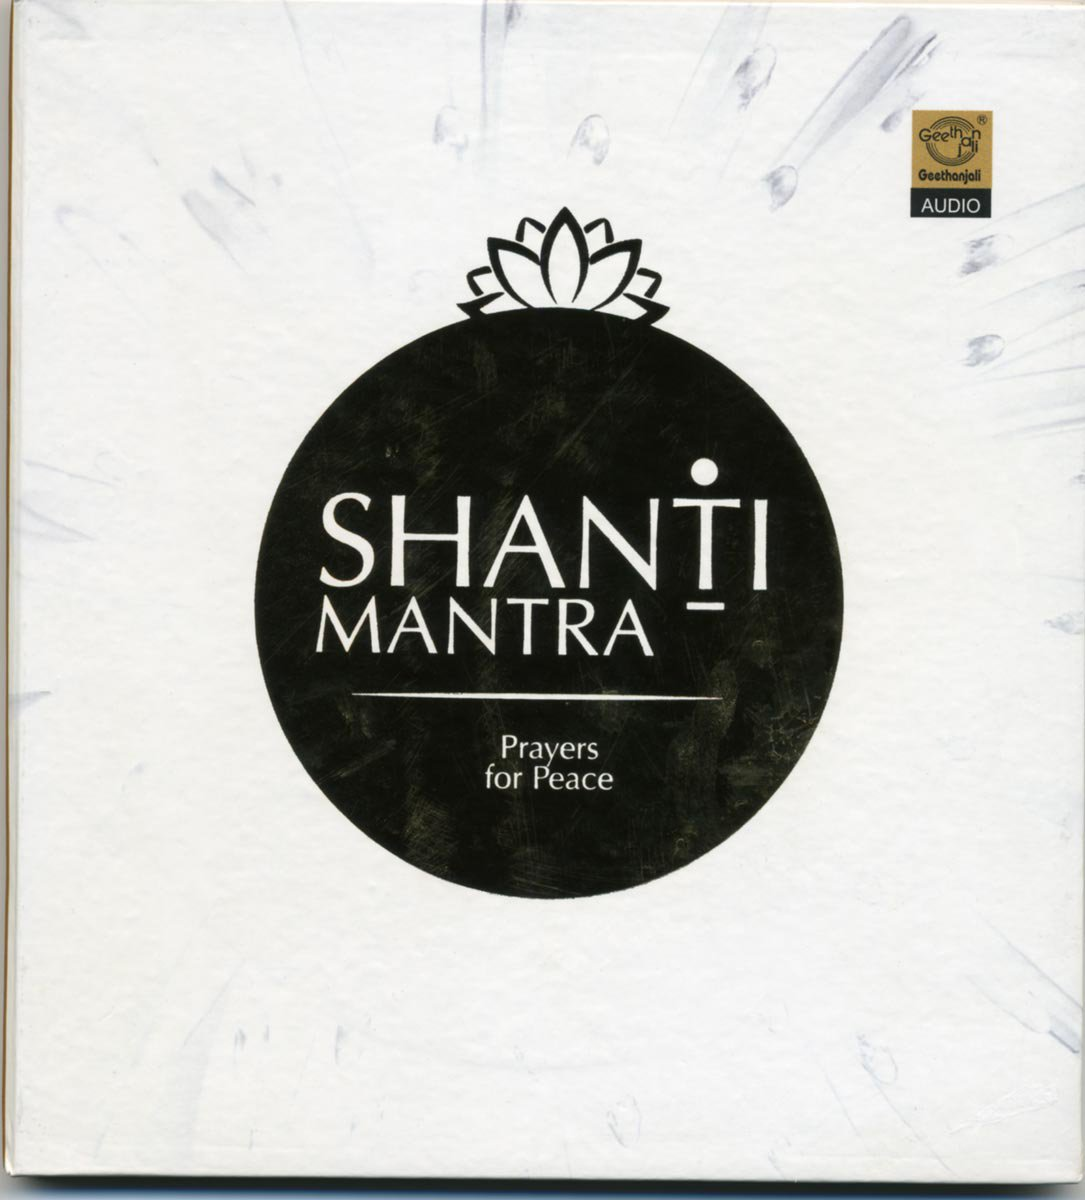 Shanti Mantra - Prayers for Peace